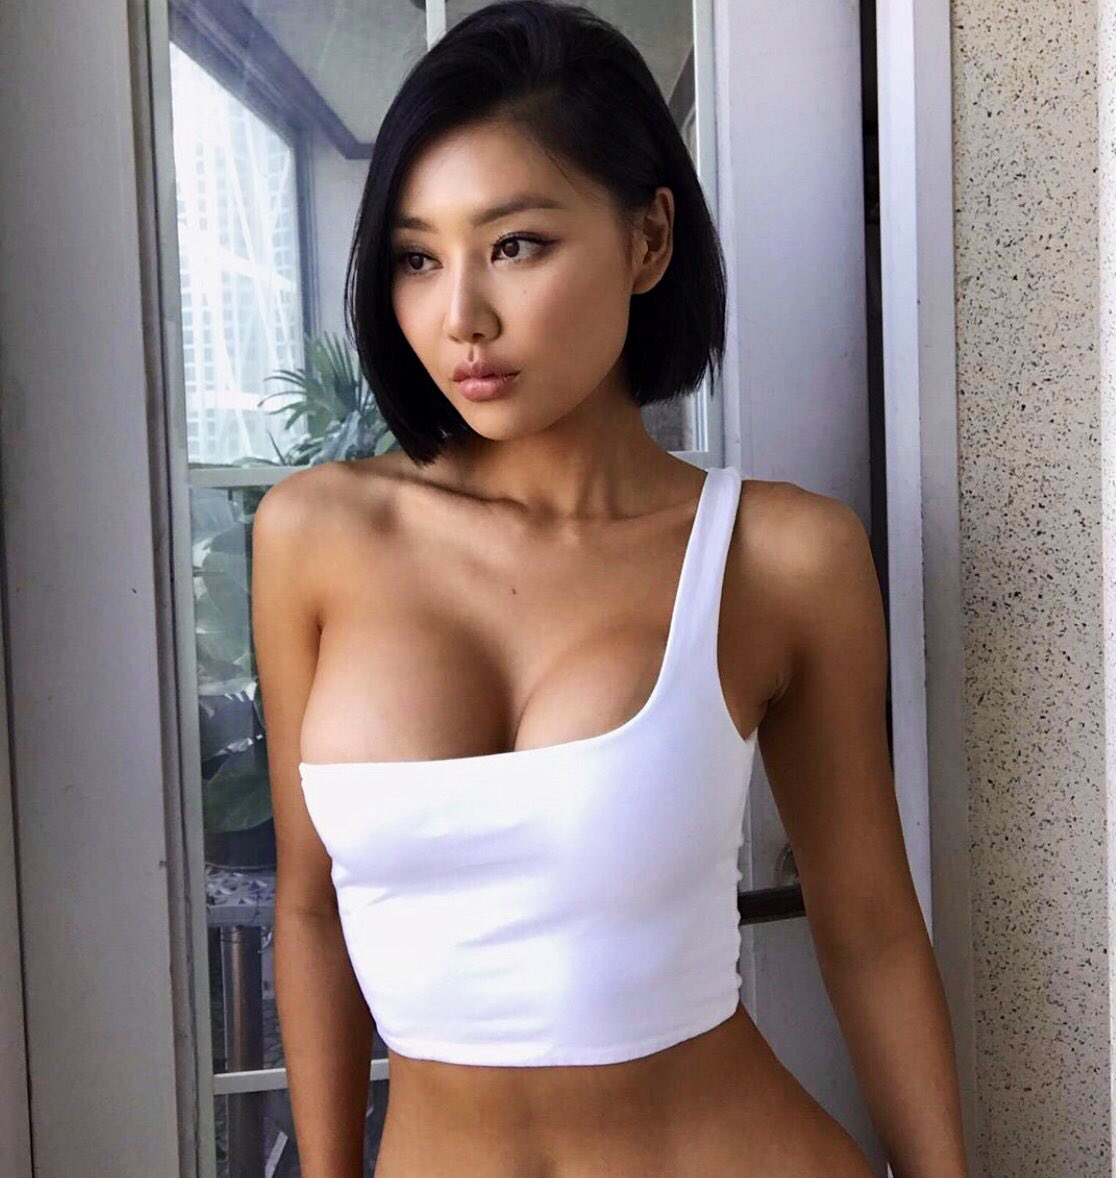 Emo girls web cam naked